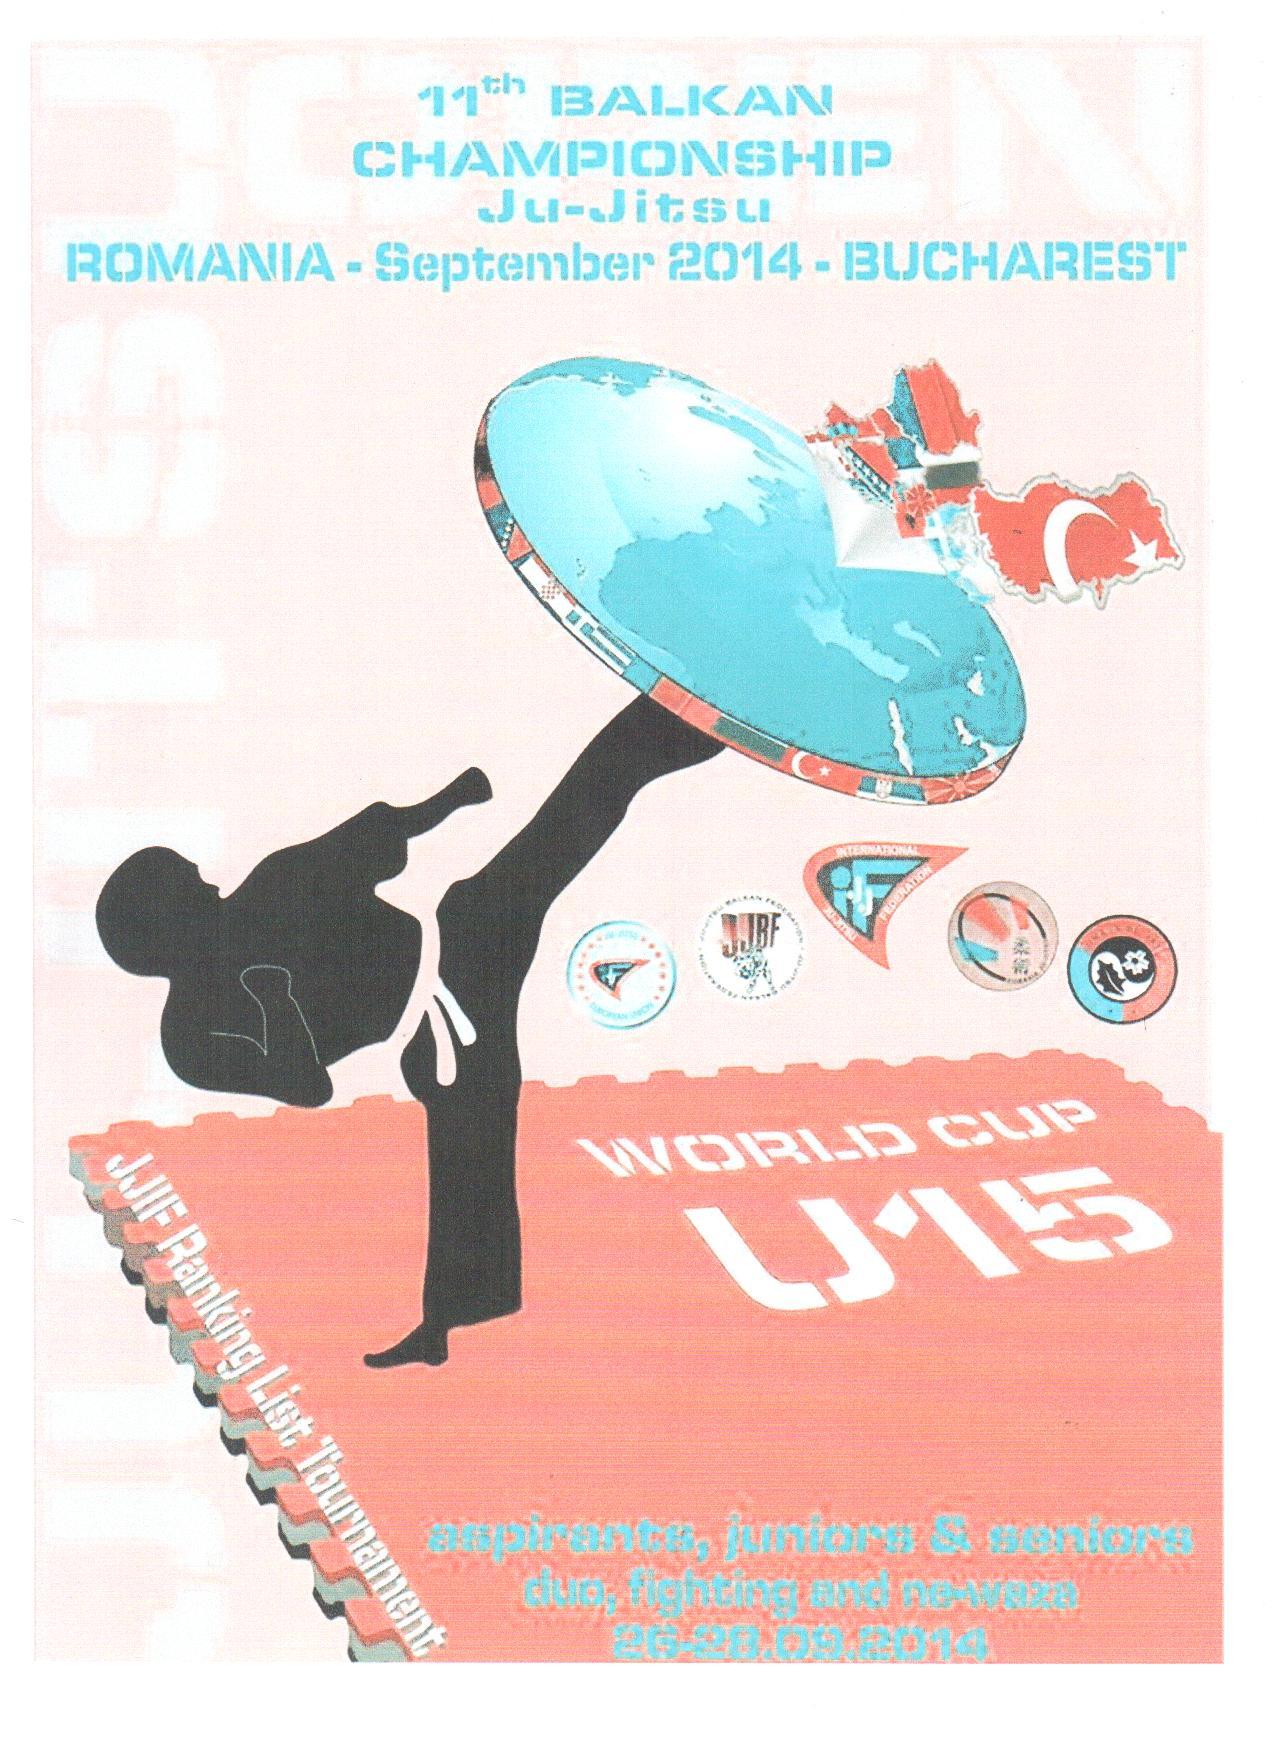 ПМ до 15 лет Бухарест Румыния.jpg